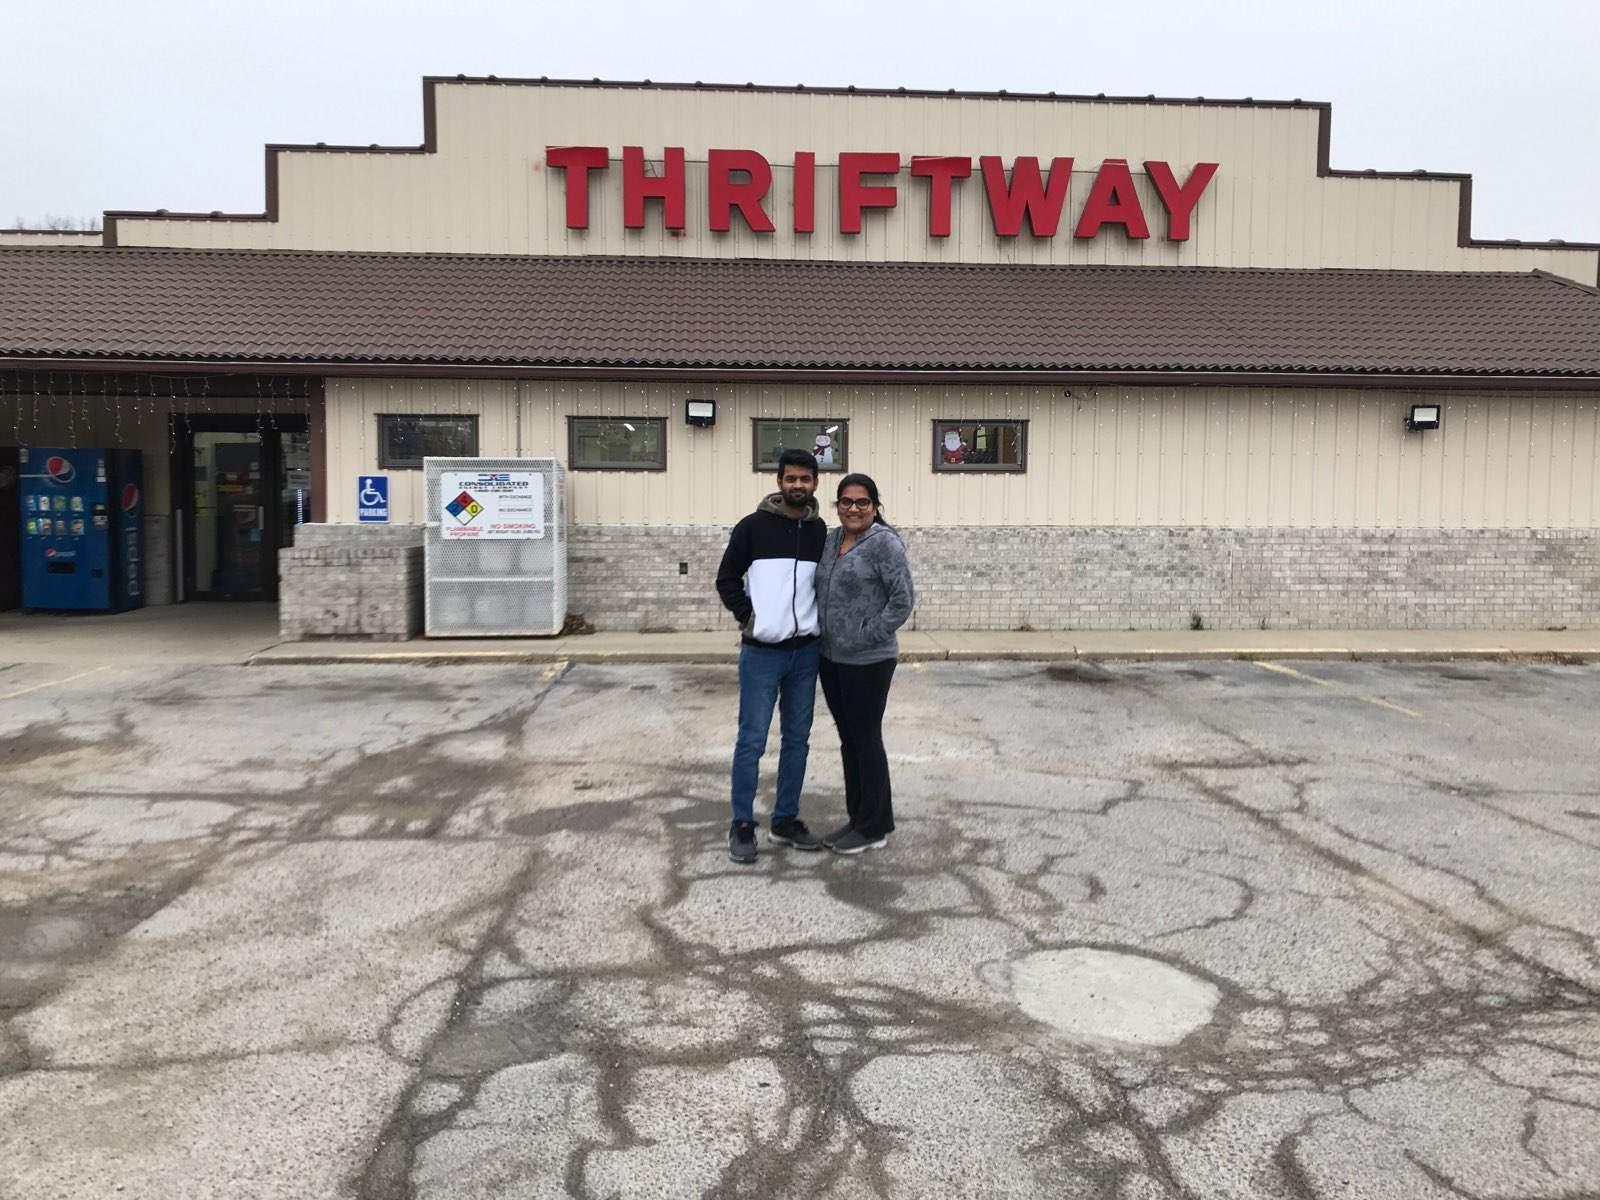 thriftway la porte city Iowa